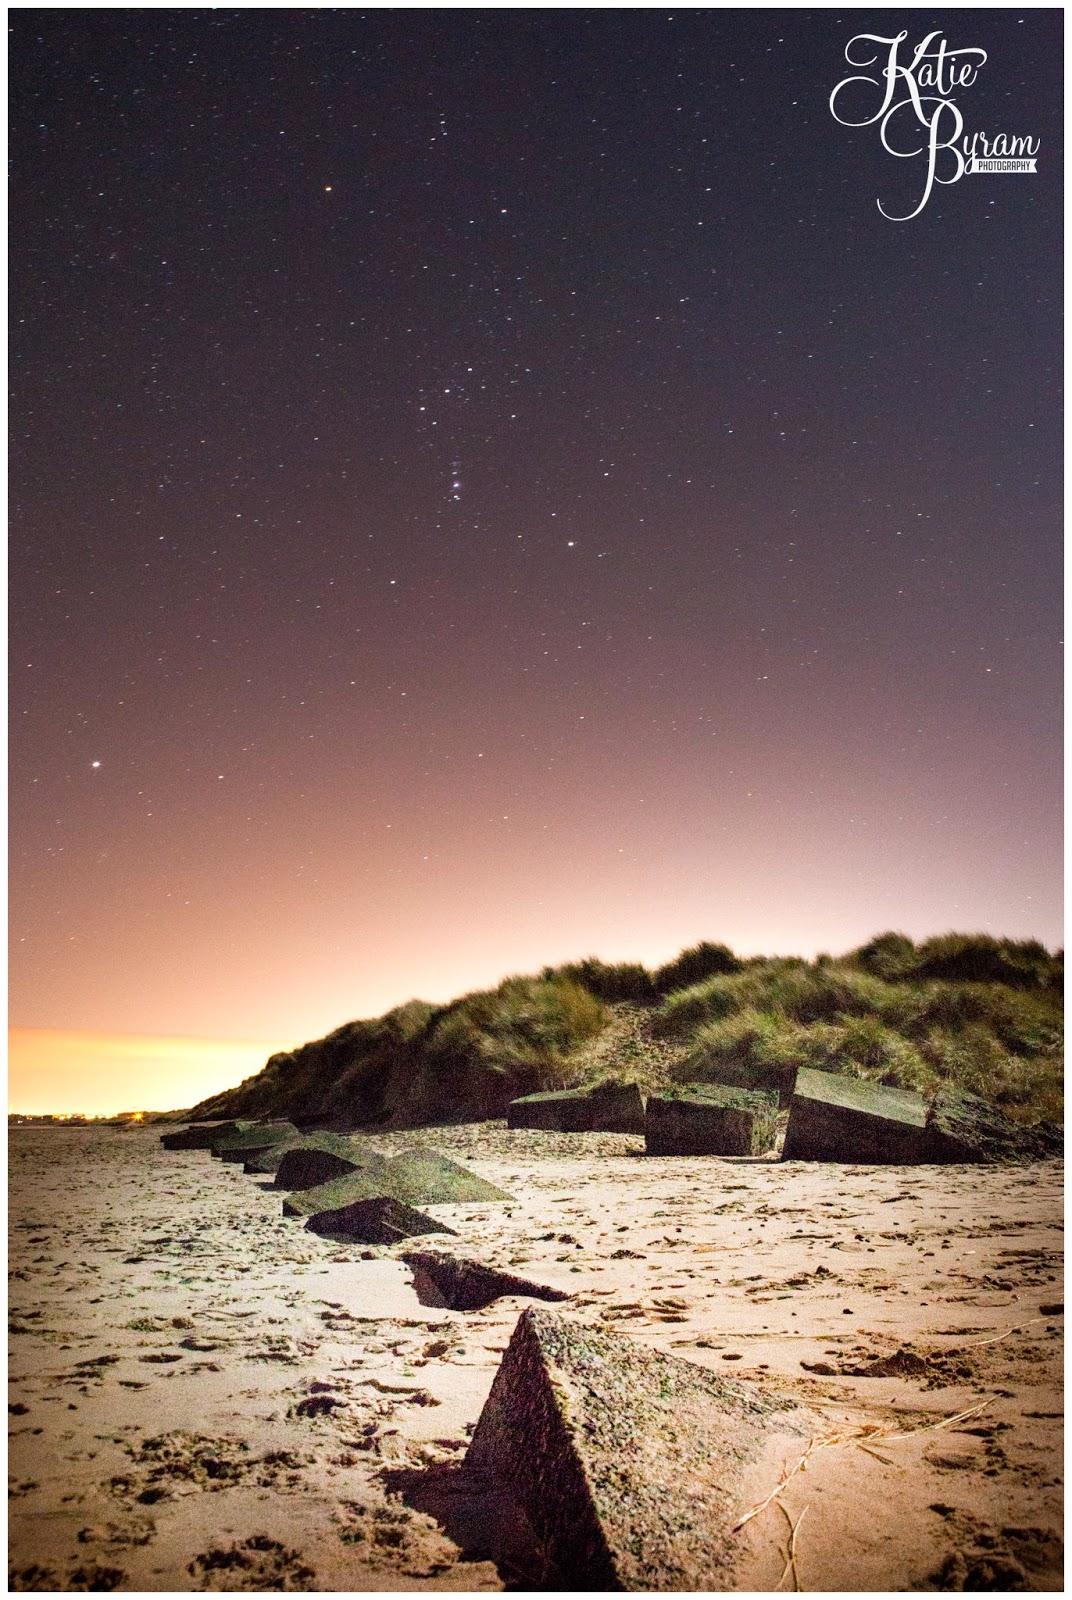 druridge bay, druridge, northumberland coast, northumberland, starry night, starry sky, night sky, orions belt, beach war defences, aurora hunting, katie byram photography